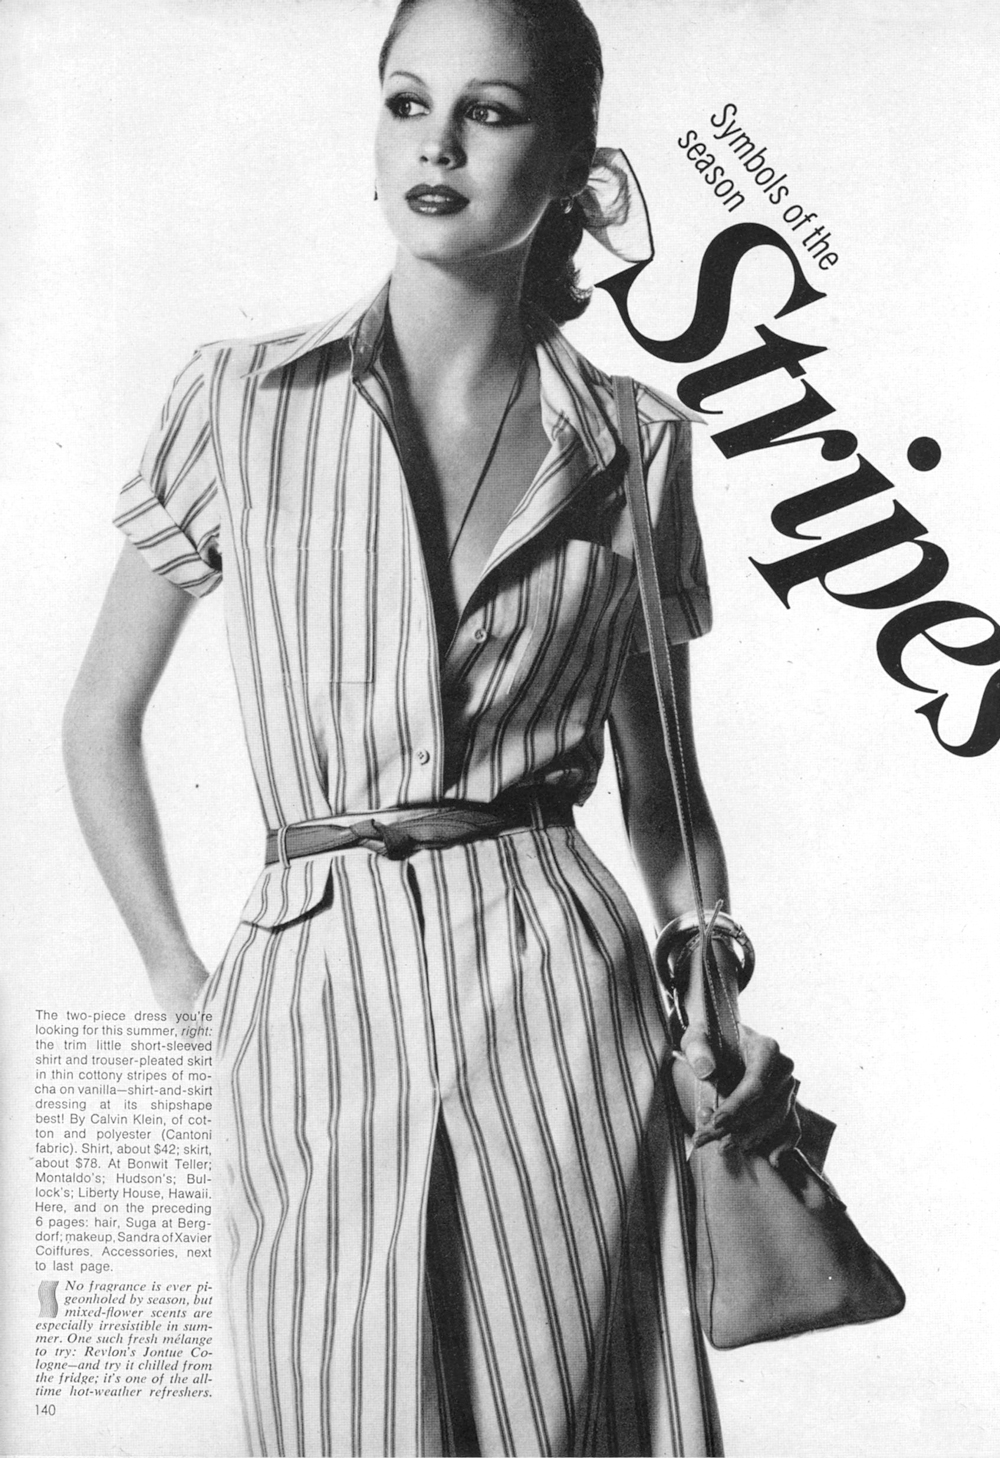 Calvin Klein shirt & skirt / shirtdress design from 1976 / via fashioned by love british fashion blog